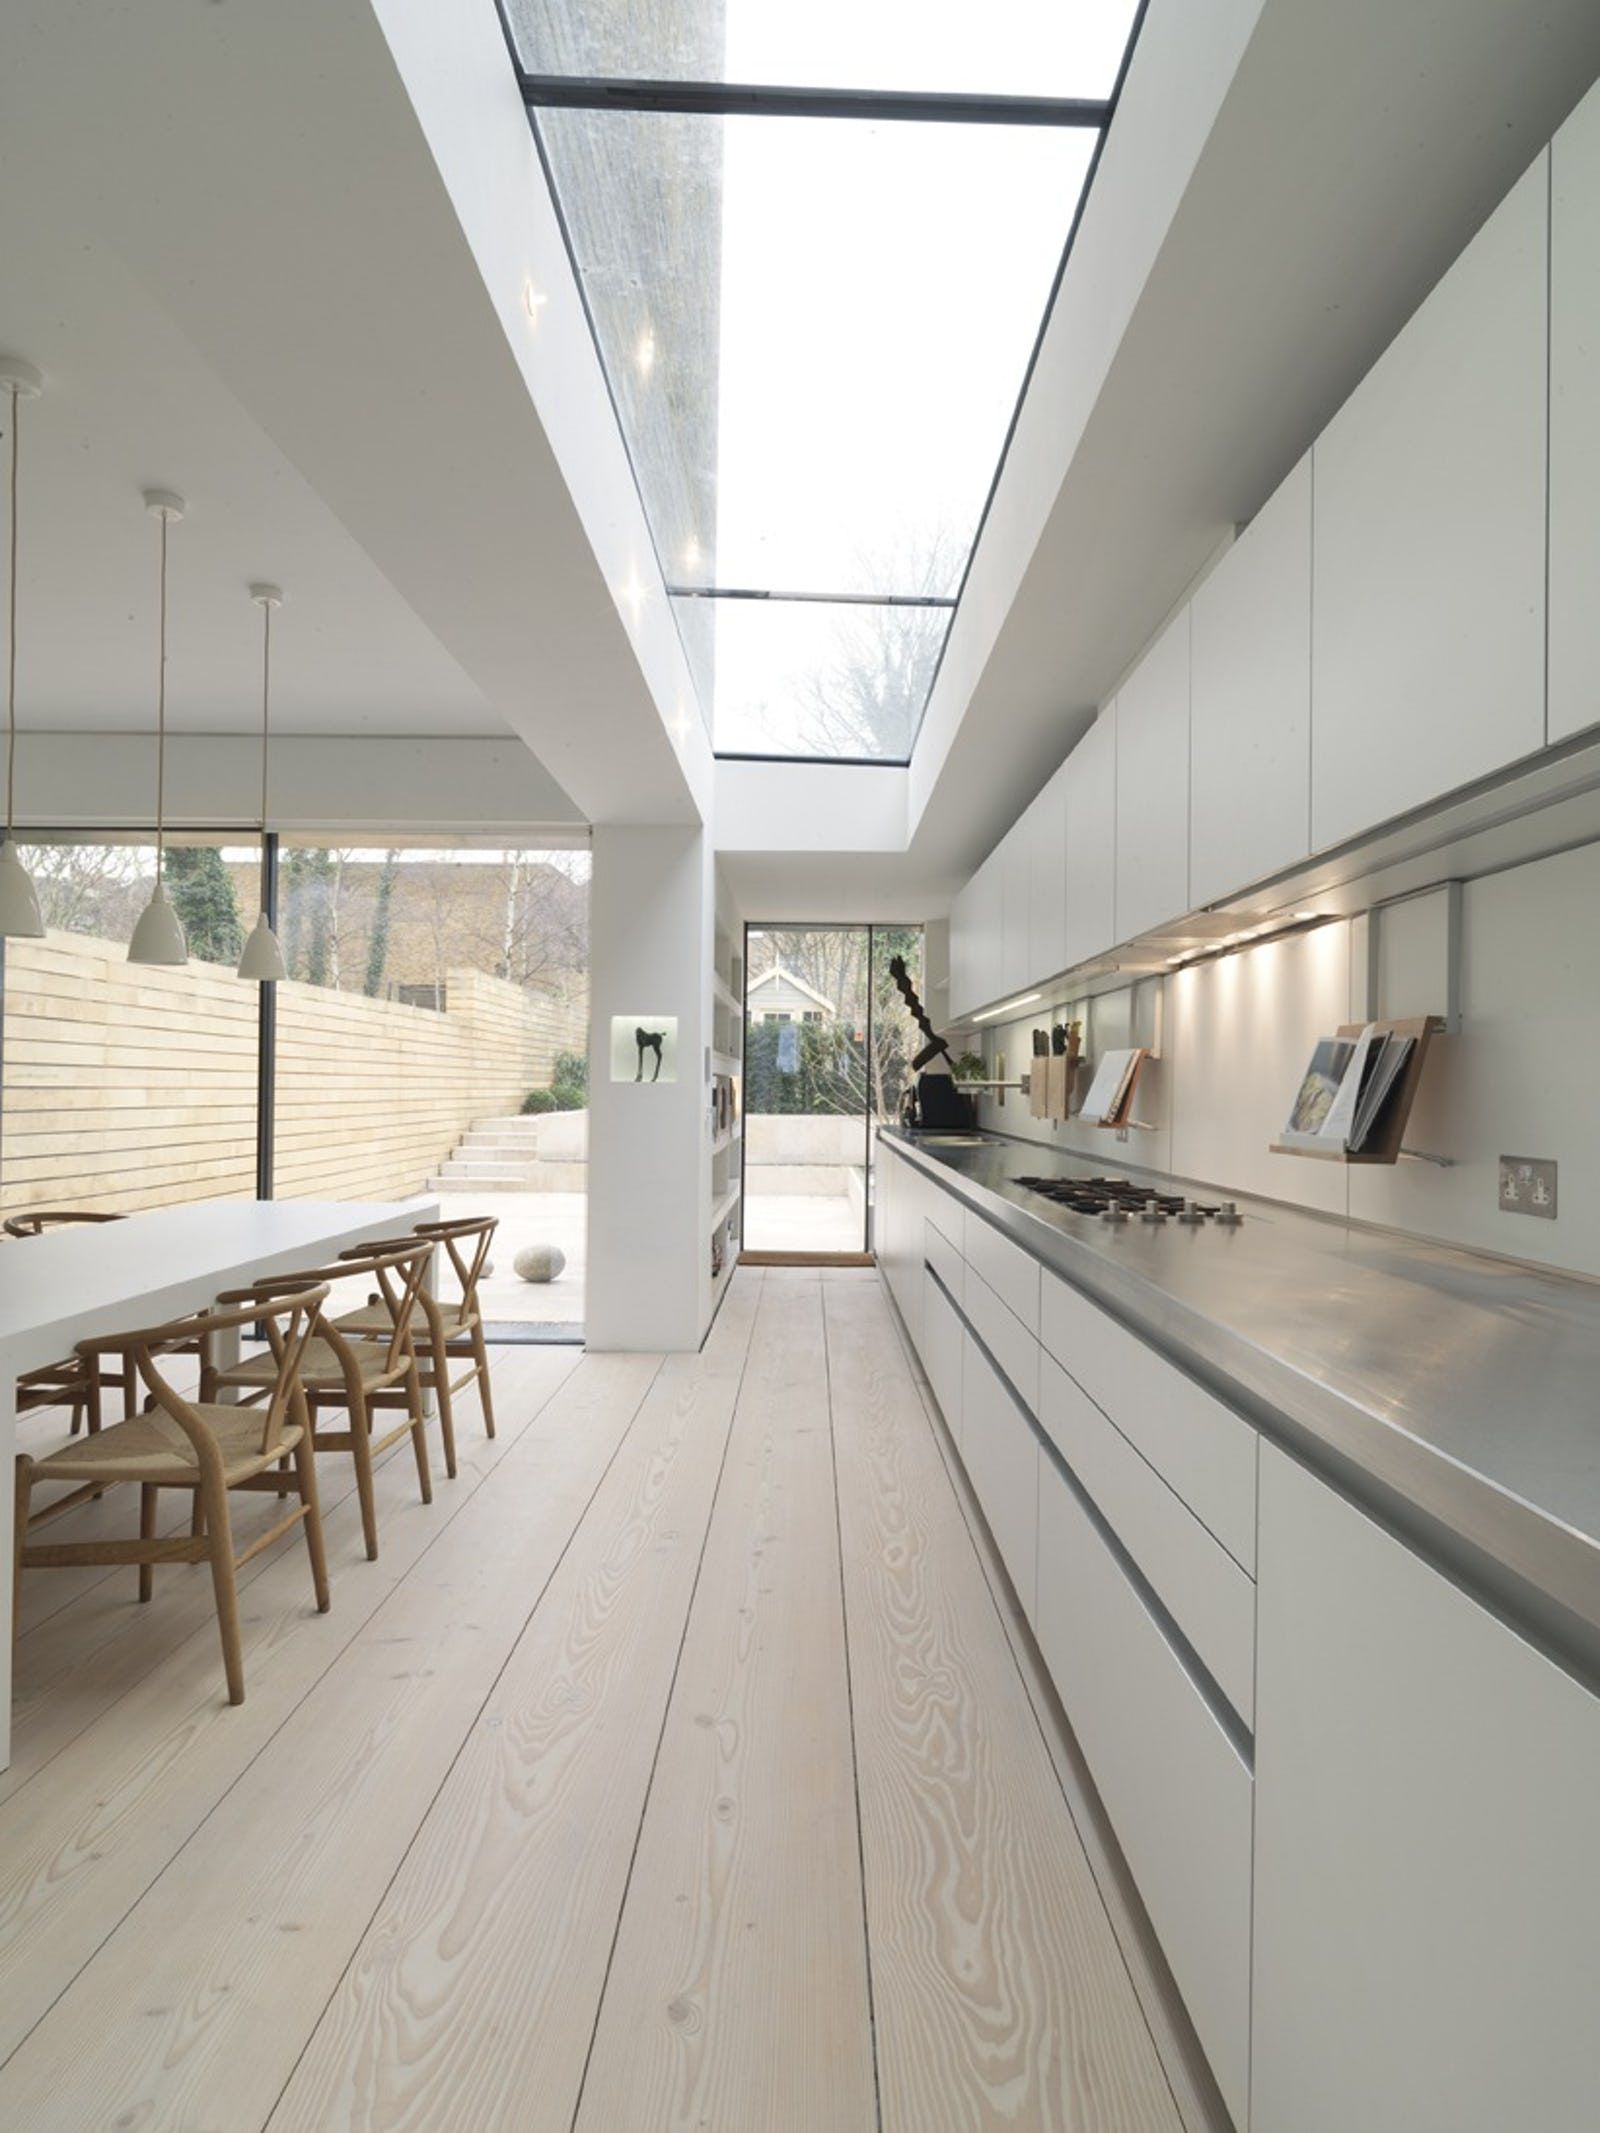 Arkitektens miljøvenlige hus